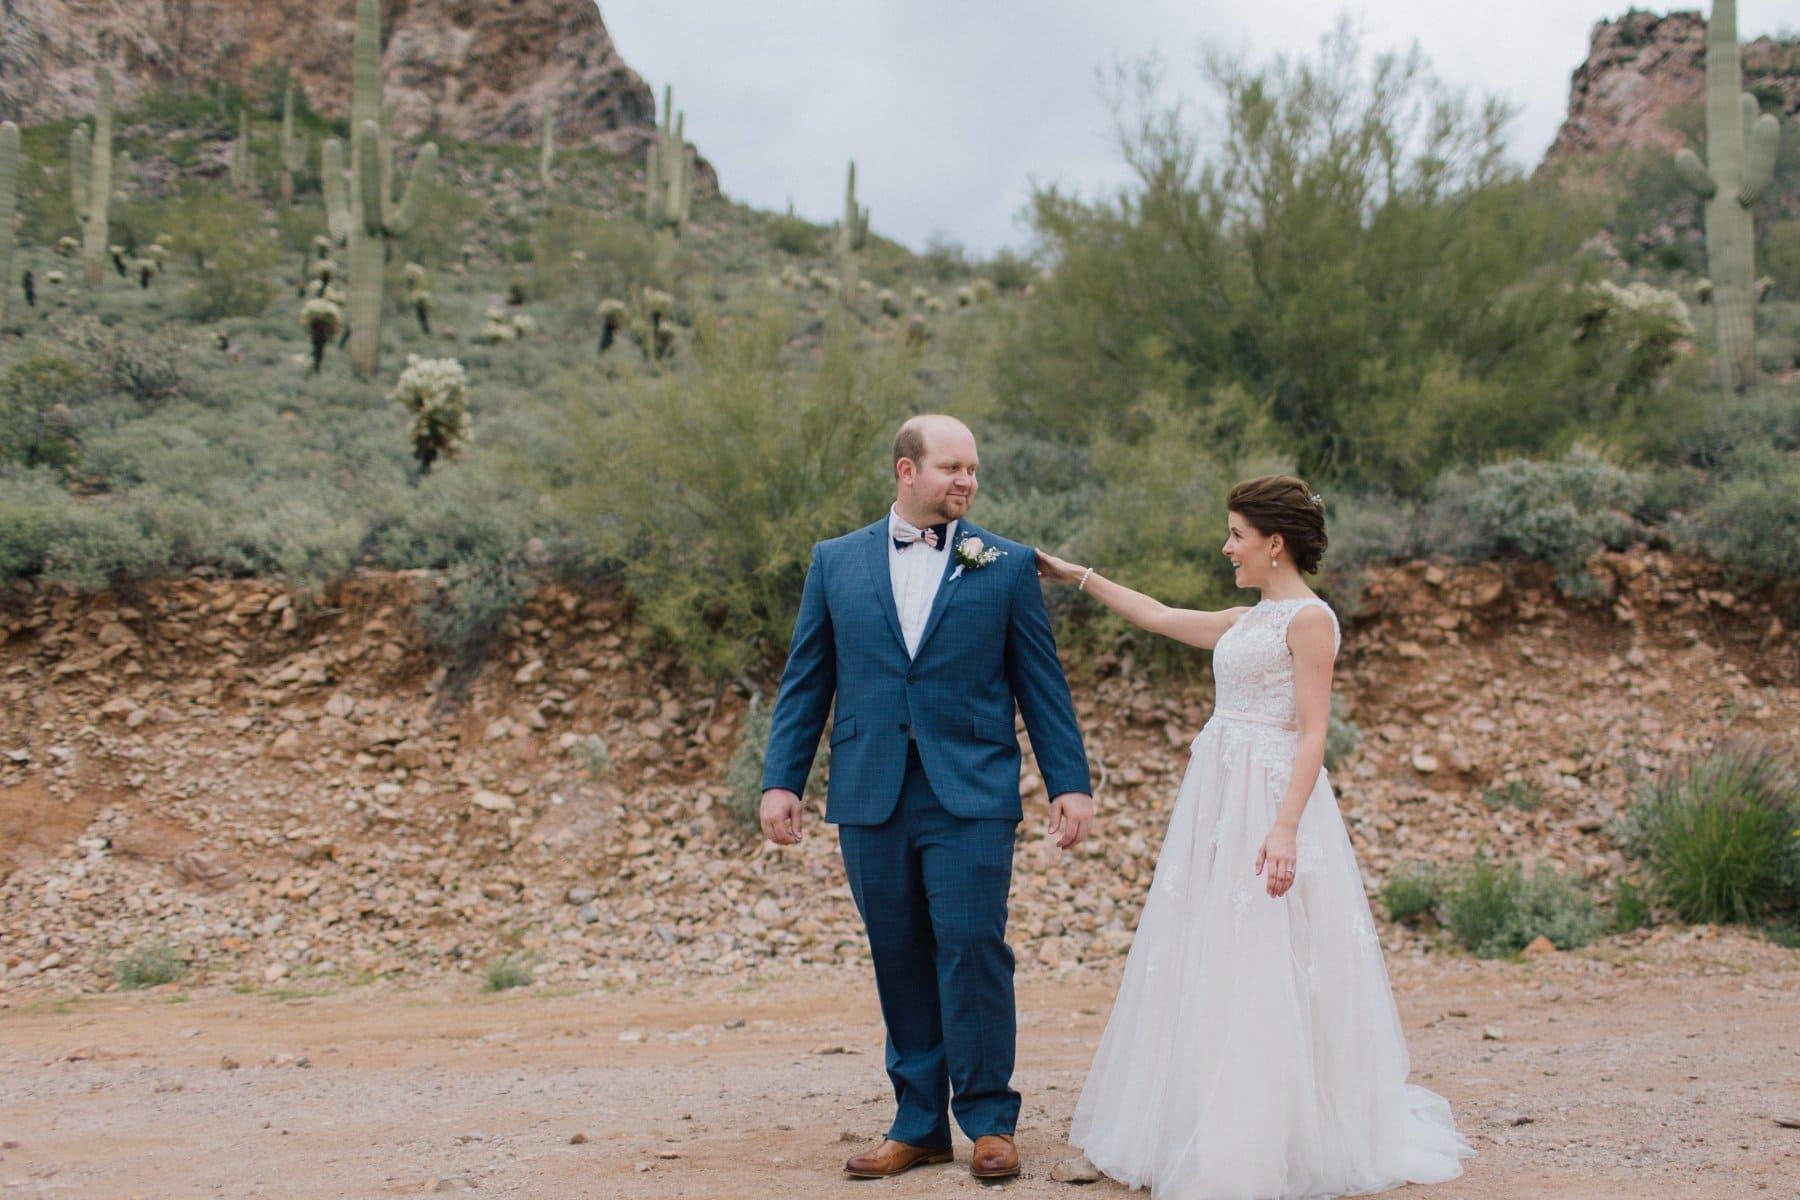 bride & groom first look in the desert Gold Canyon Golf Resort wedding